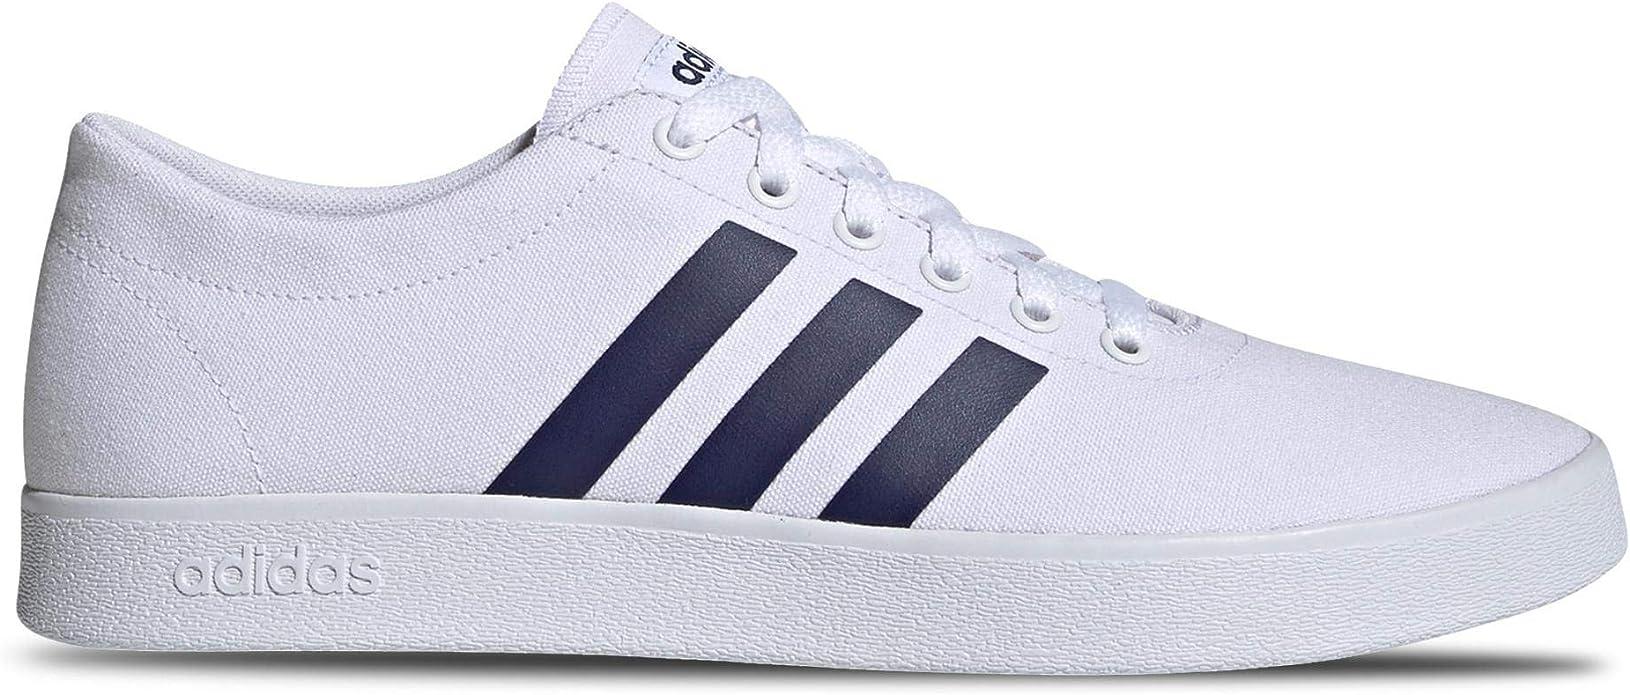 adidas Men Shoes Fashion Sneakers